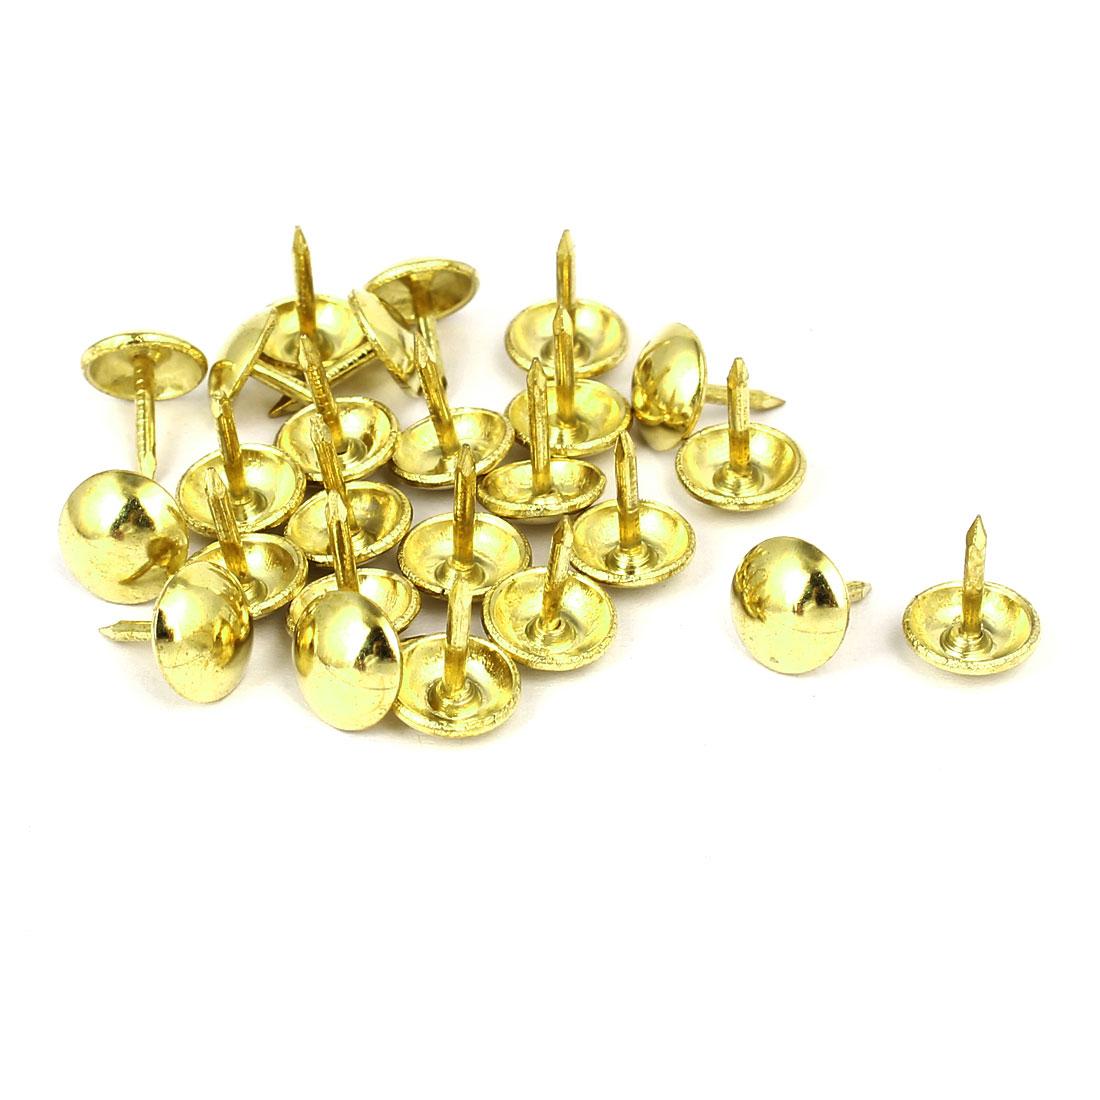 Home Furniture Upholstery Thumb Tack Nail Push Pin Gold Tone 9mm x 11mm 25pcs